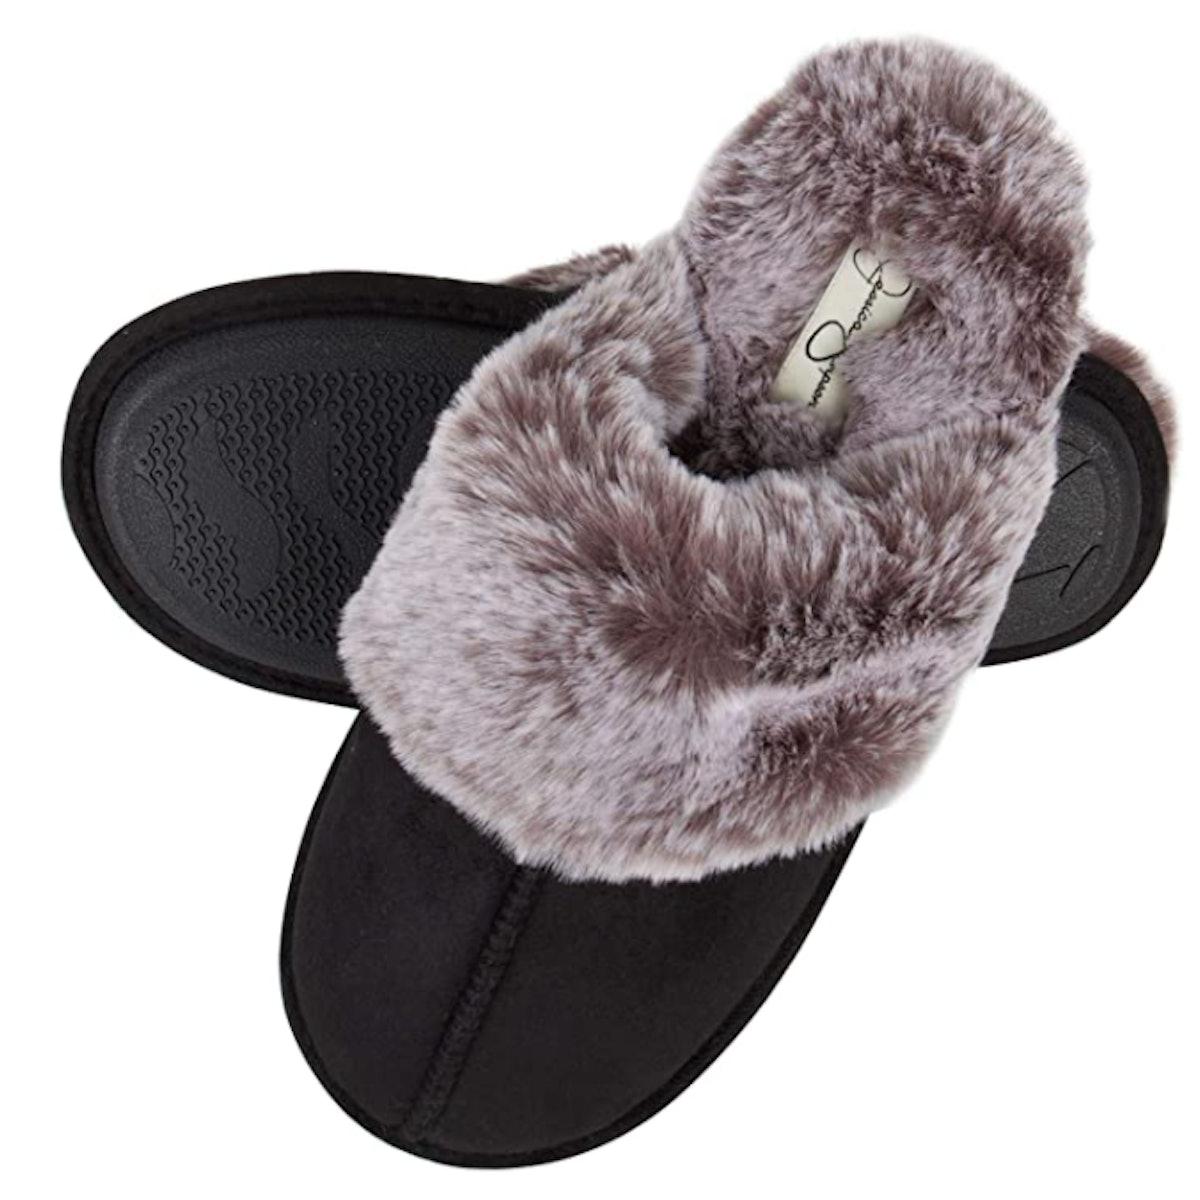 Jessica Simpson Memory Foam Faux Fur Slippers